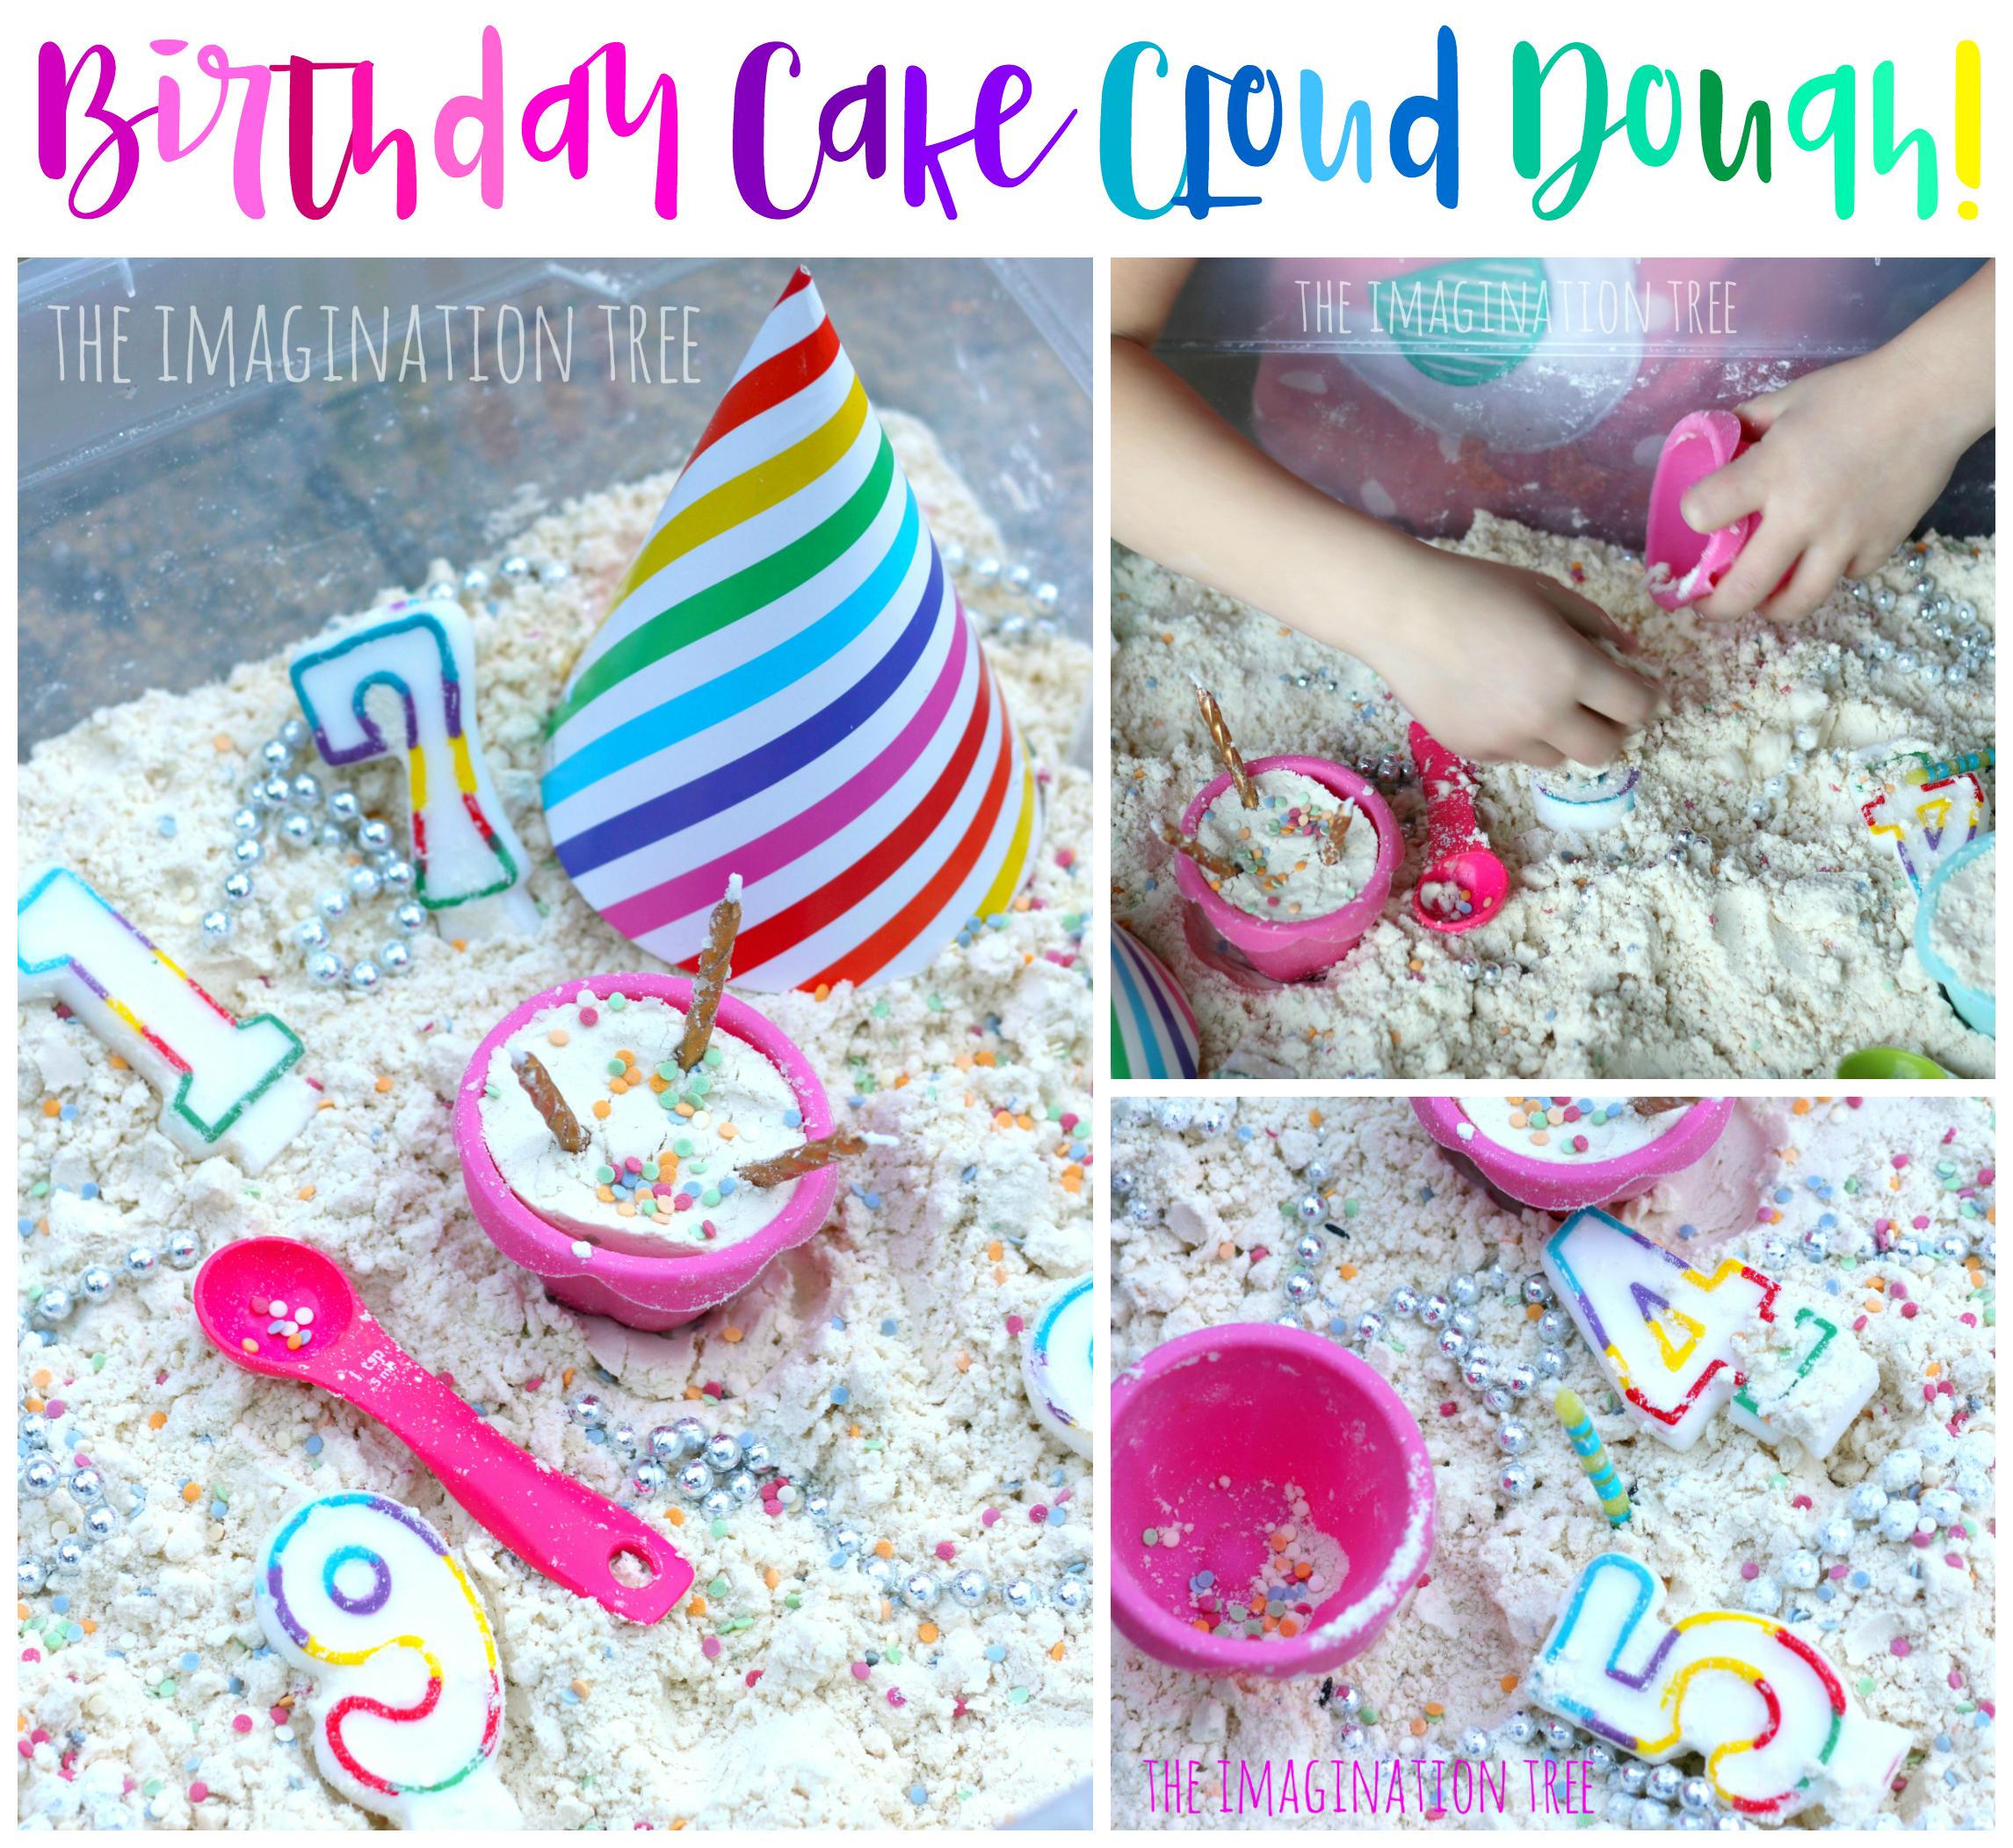 Birthday Cake Cloud Dough The Imagination Tree